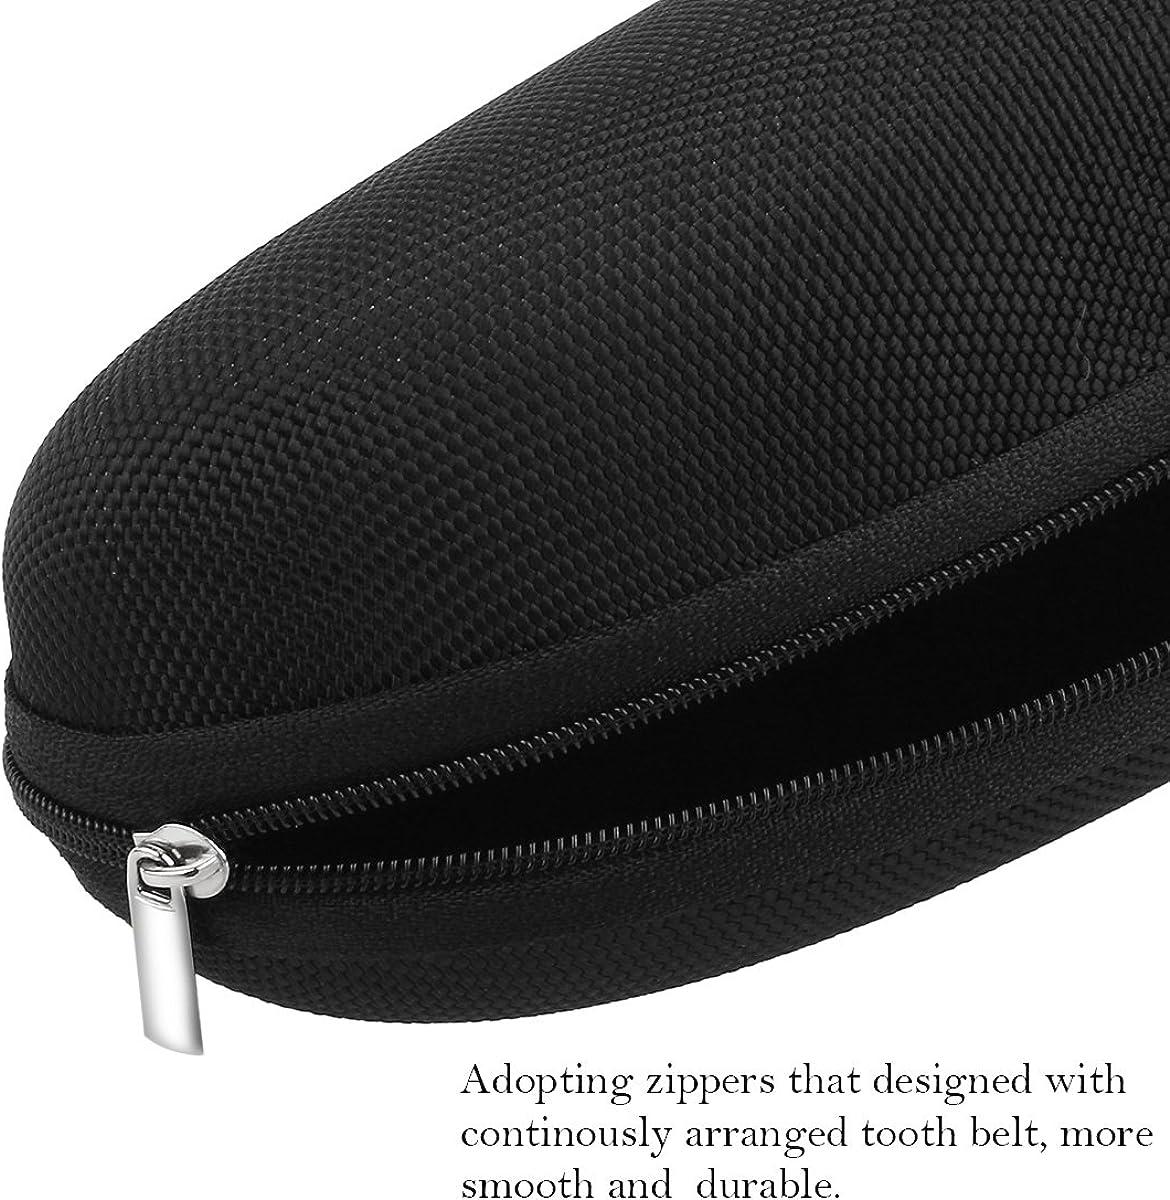 PIXNOR Sunglasses Eyeglasses Zipper Hard Case Protective Box with Hook Black